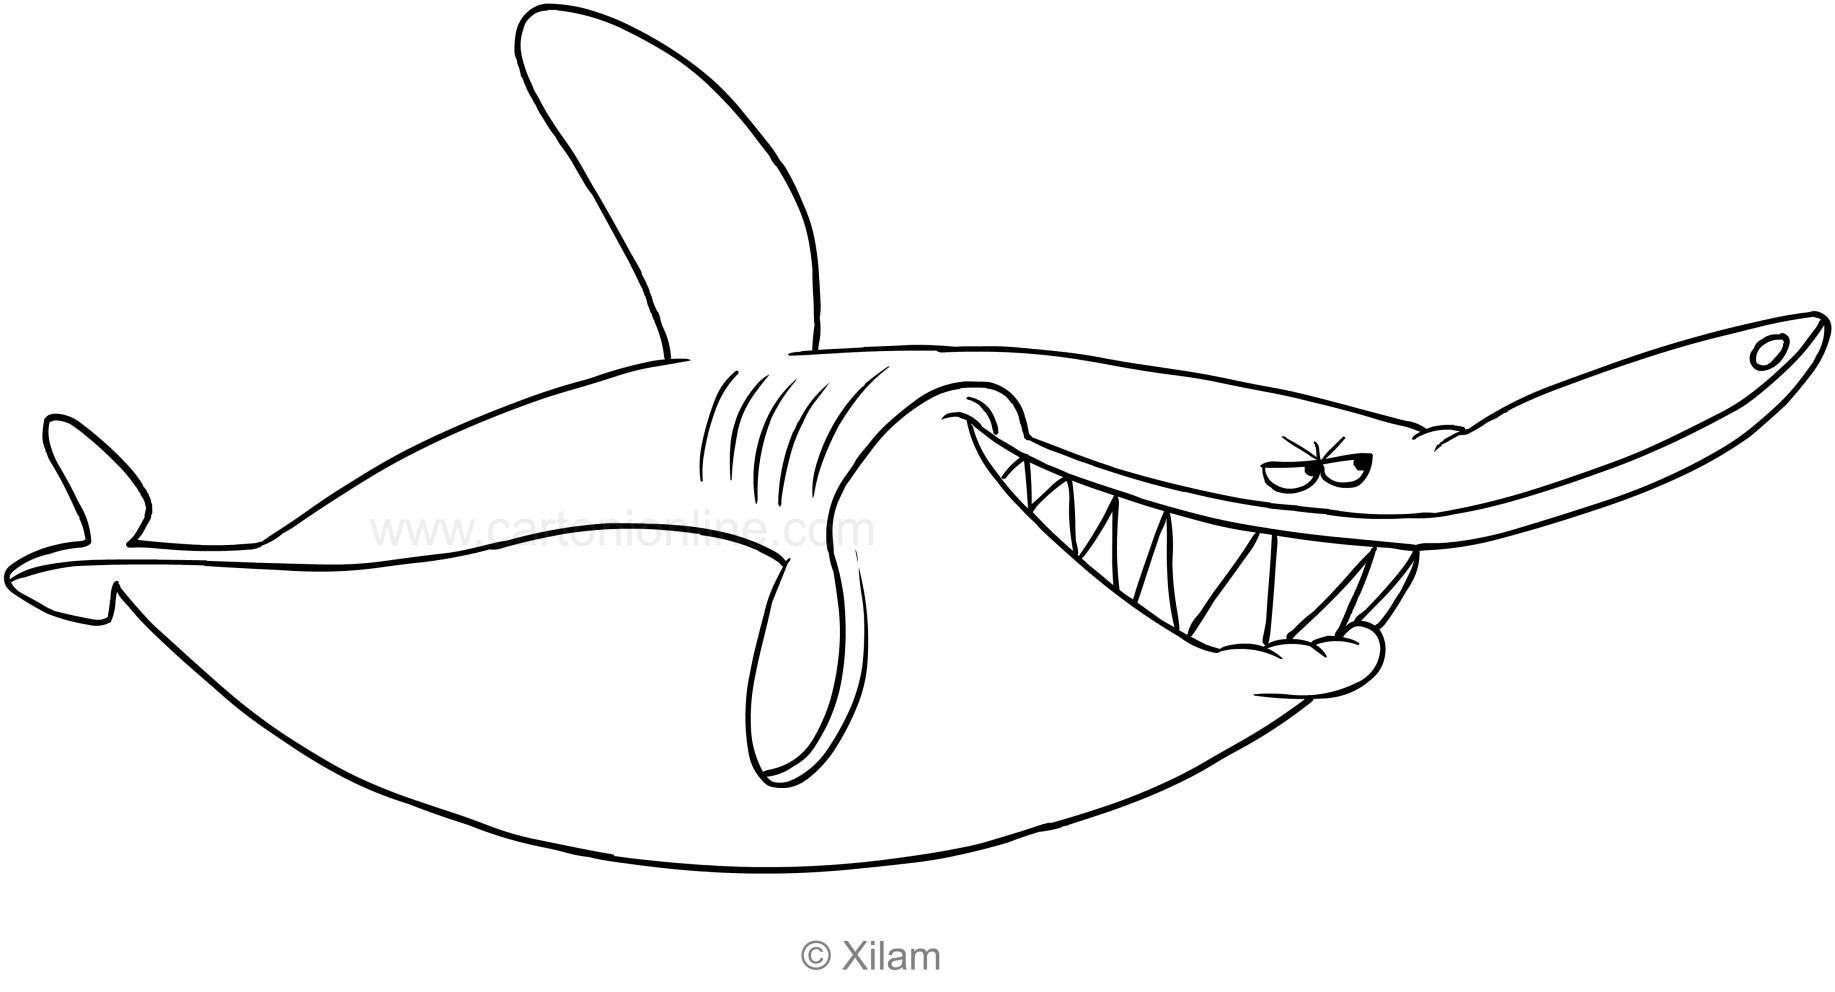 Coloriage De Sharko Le Requin concernant Coloriage Requin À Imprimer